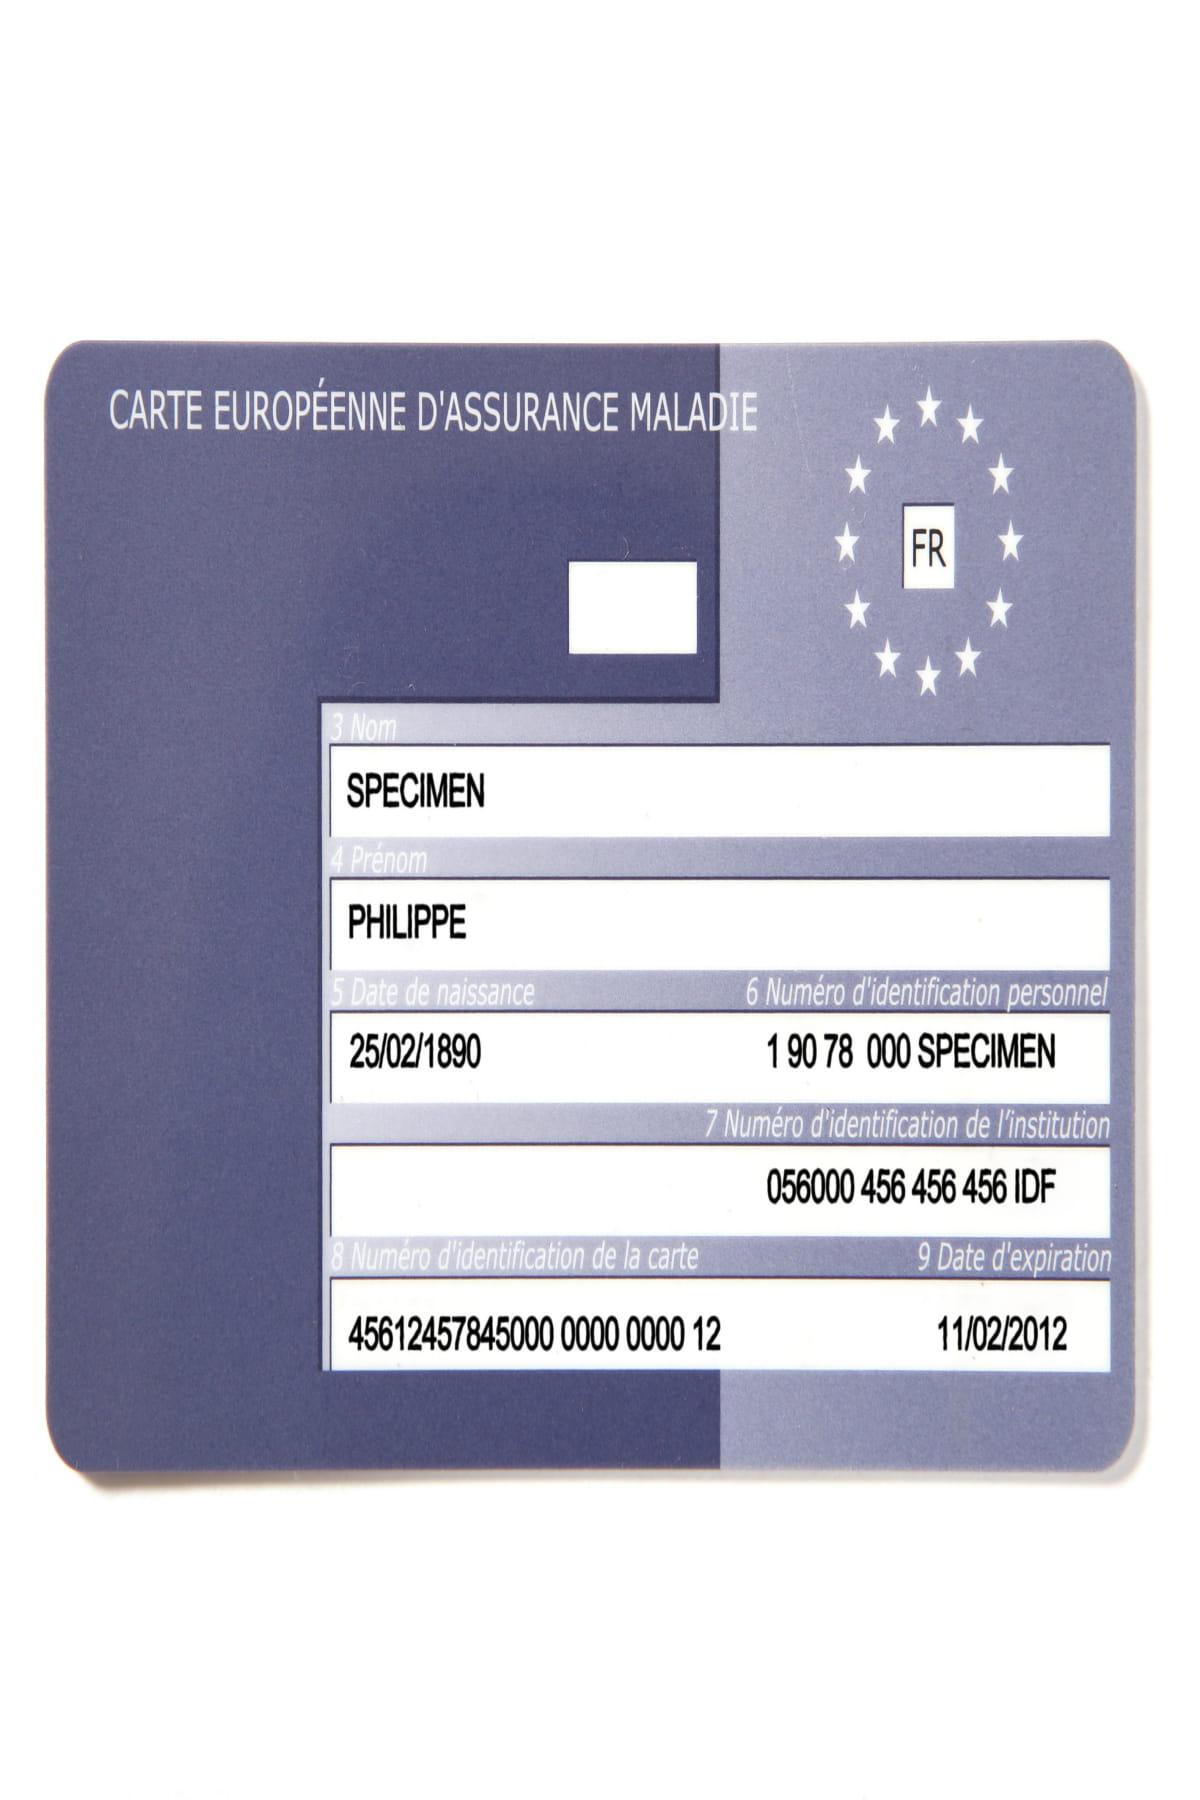 Carte Assurance Maladie Naissance.Demander Sa Carte Europeenne D Assurance Maladie